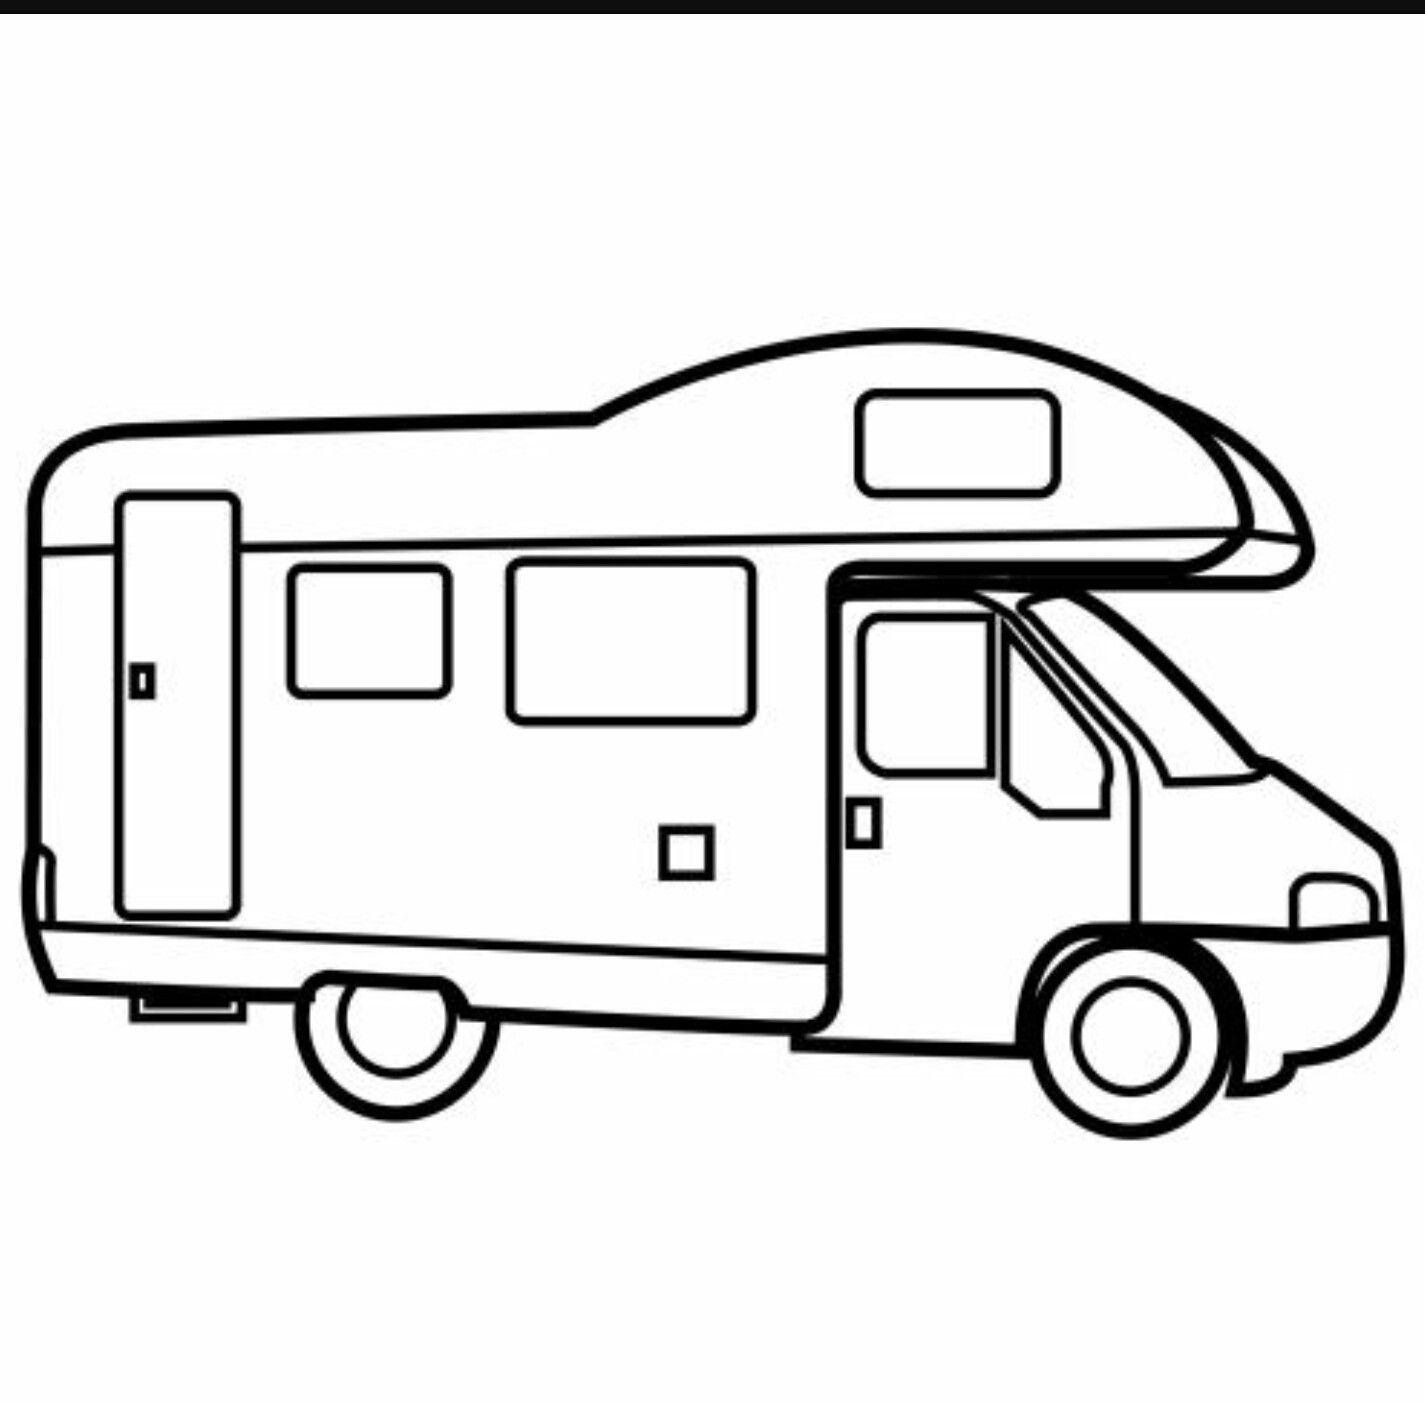 Pin by Joan on para imprimir  Camper drawing, Camping coloring